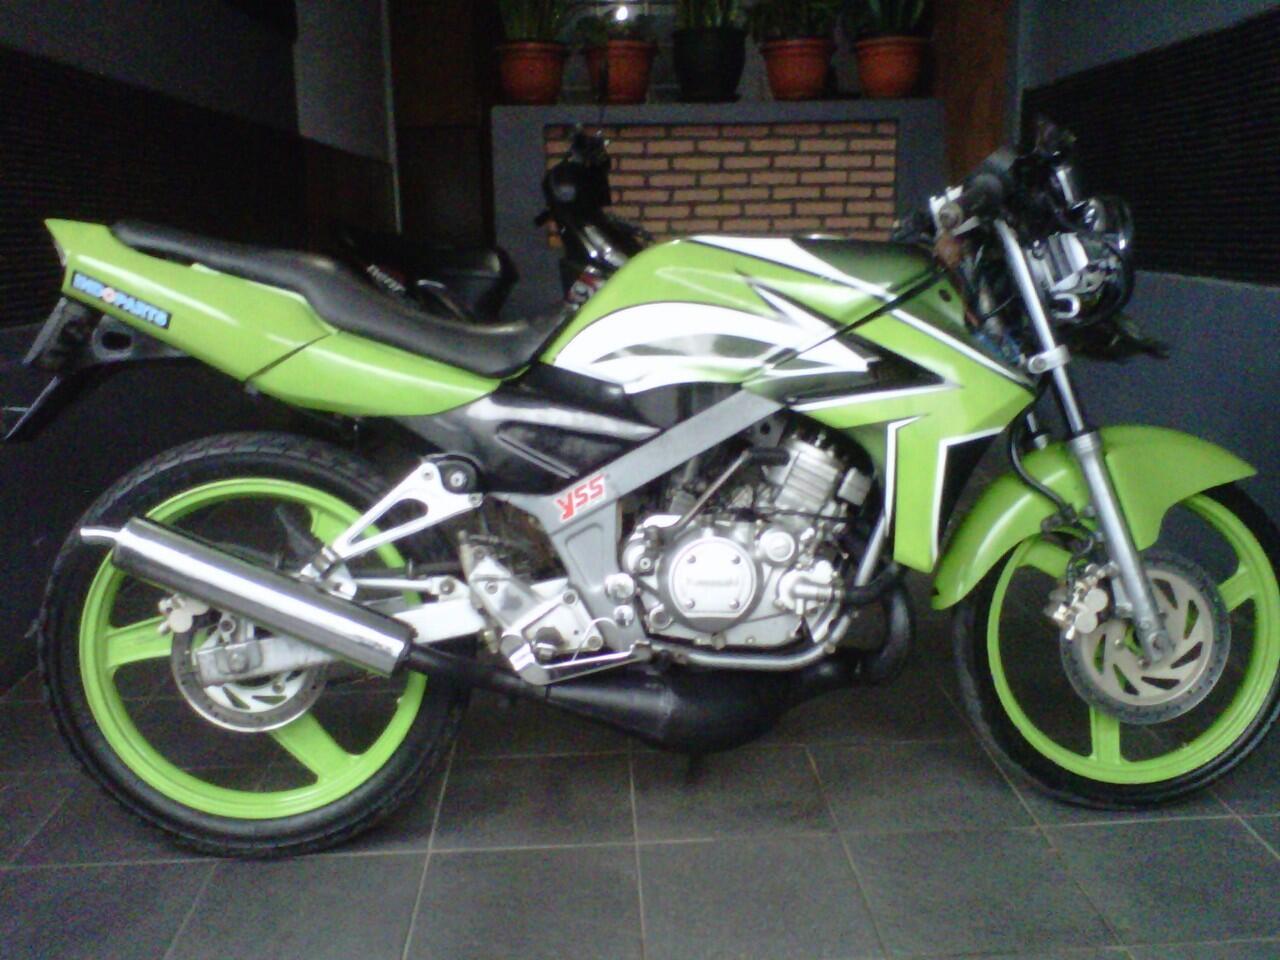 Terjual NINJA R 2004 Mulusoriterawat